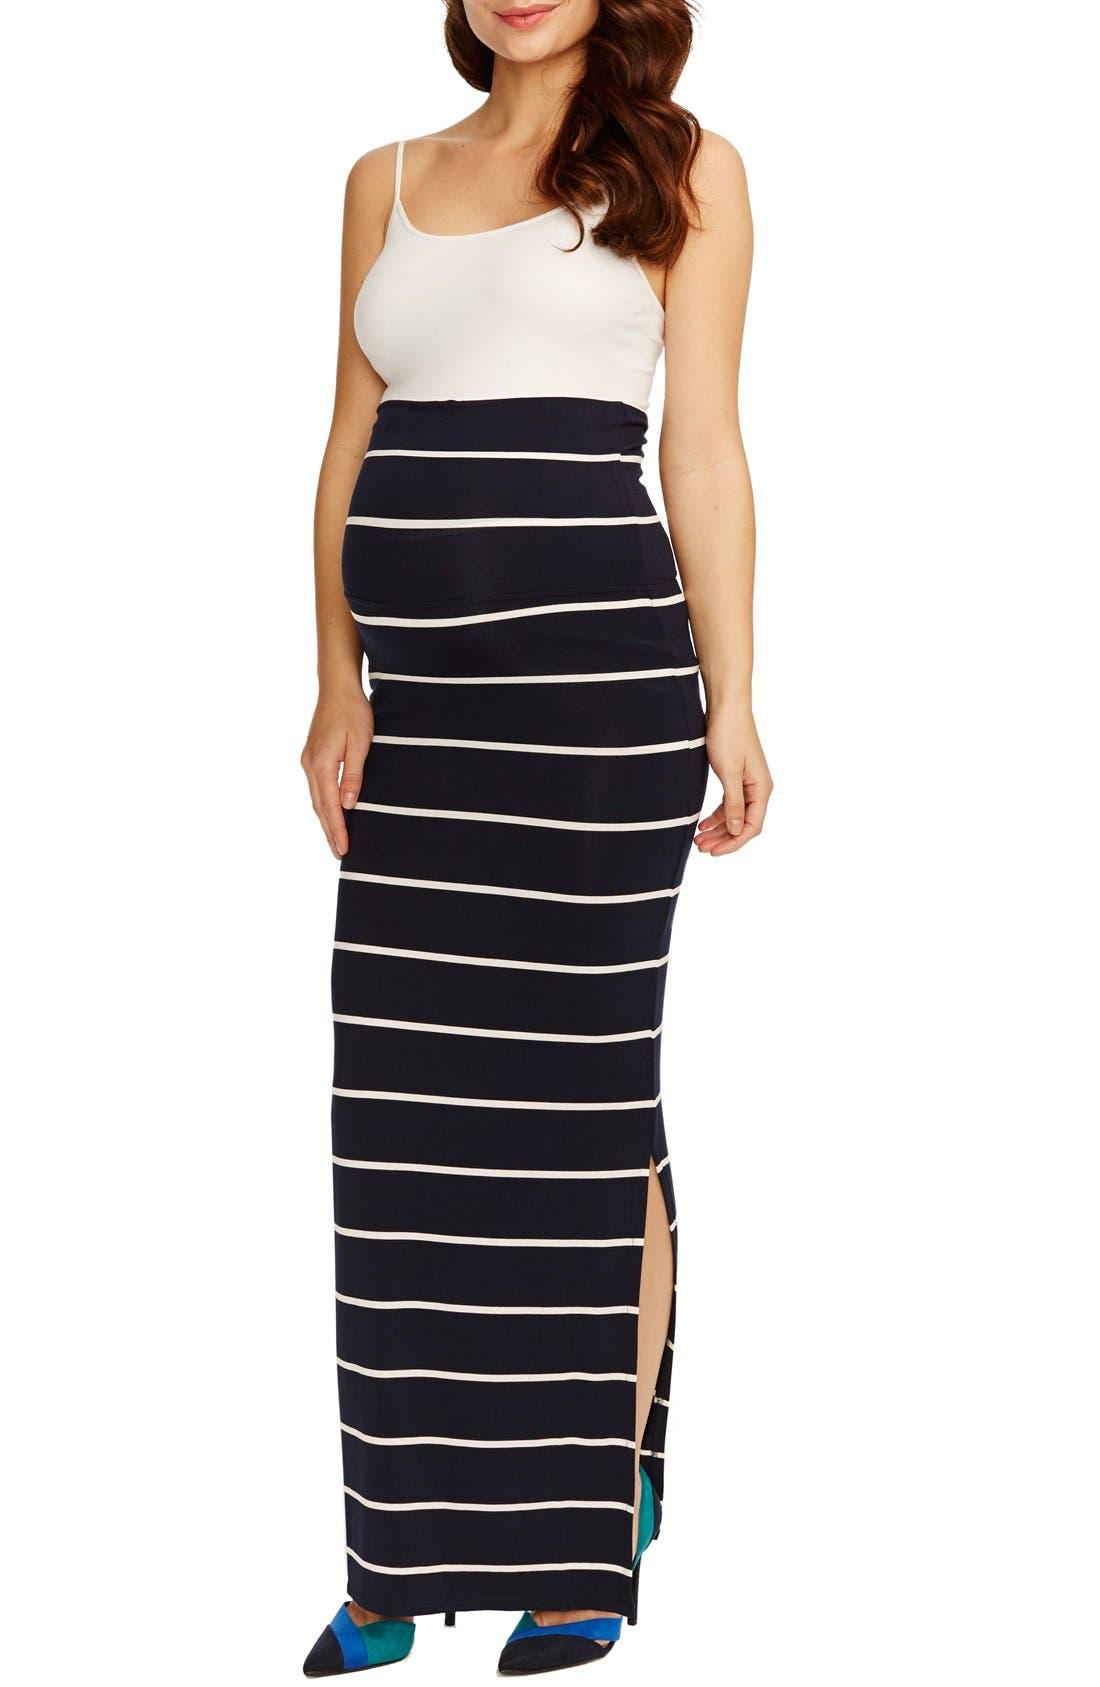 'Jessica' Stripe Maternity Maxi Skirt,                             Main thumbnail 1, color,                             NAVY WHITE STRIPE